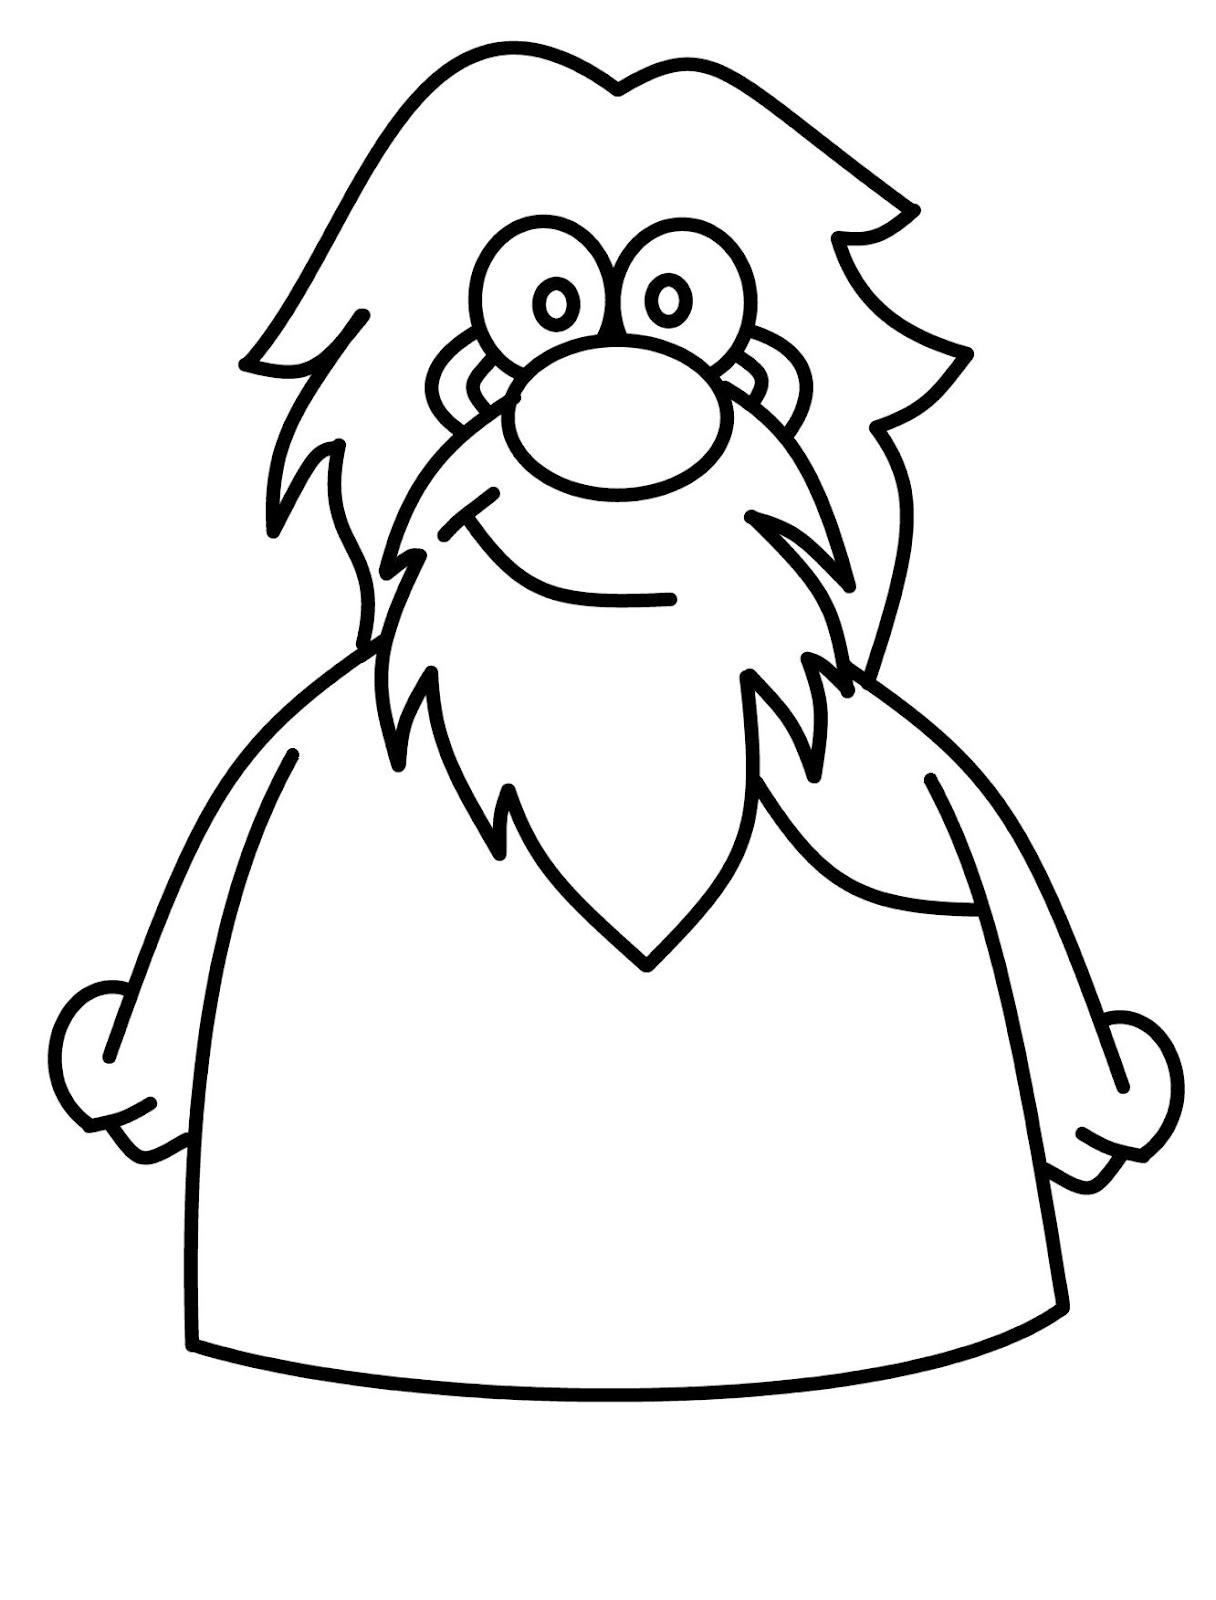 1216x1600 How To Draw Cartoons Caveman